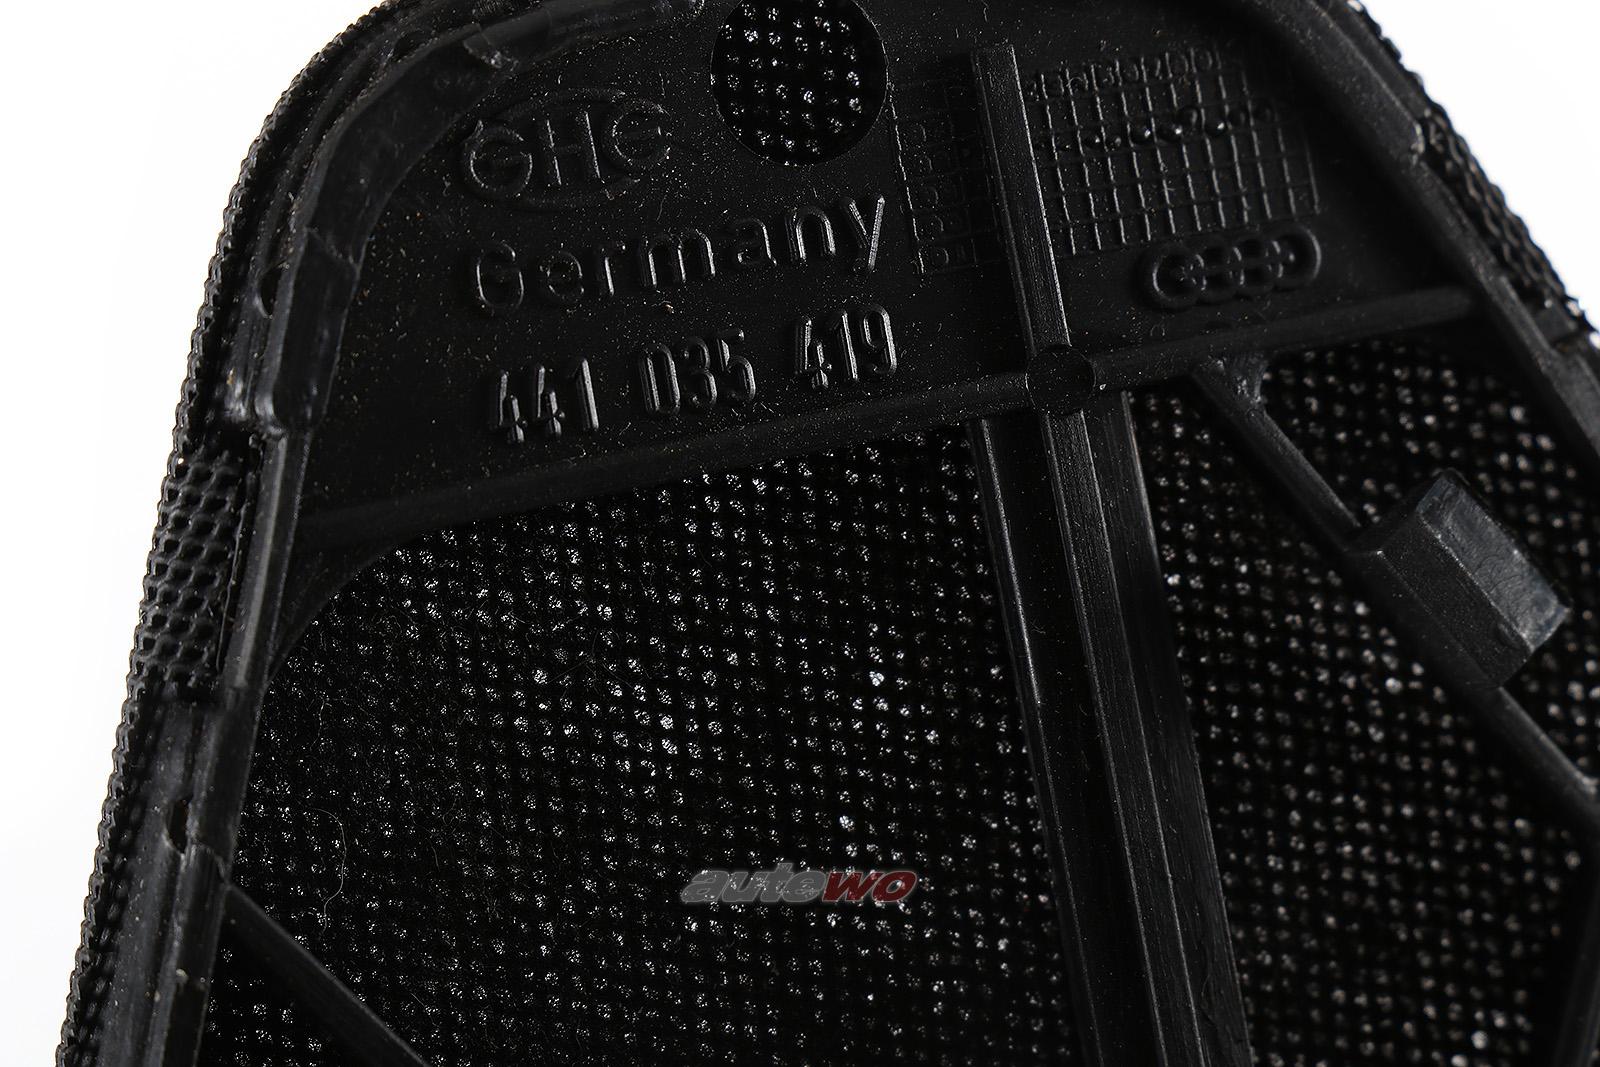 441035419 Audi 100/200 Typ 44/V8 D11 Lautsprecher Abdeckung Links